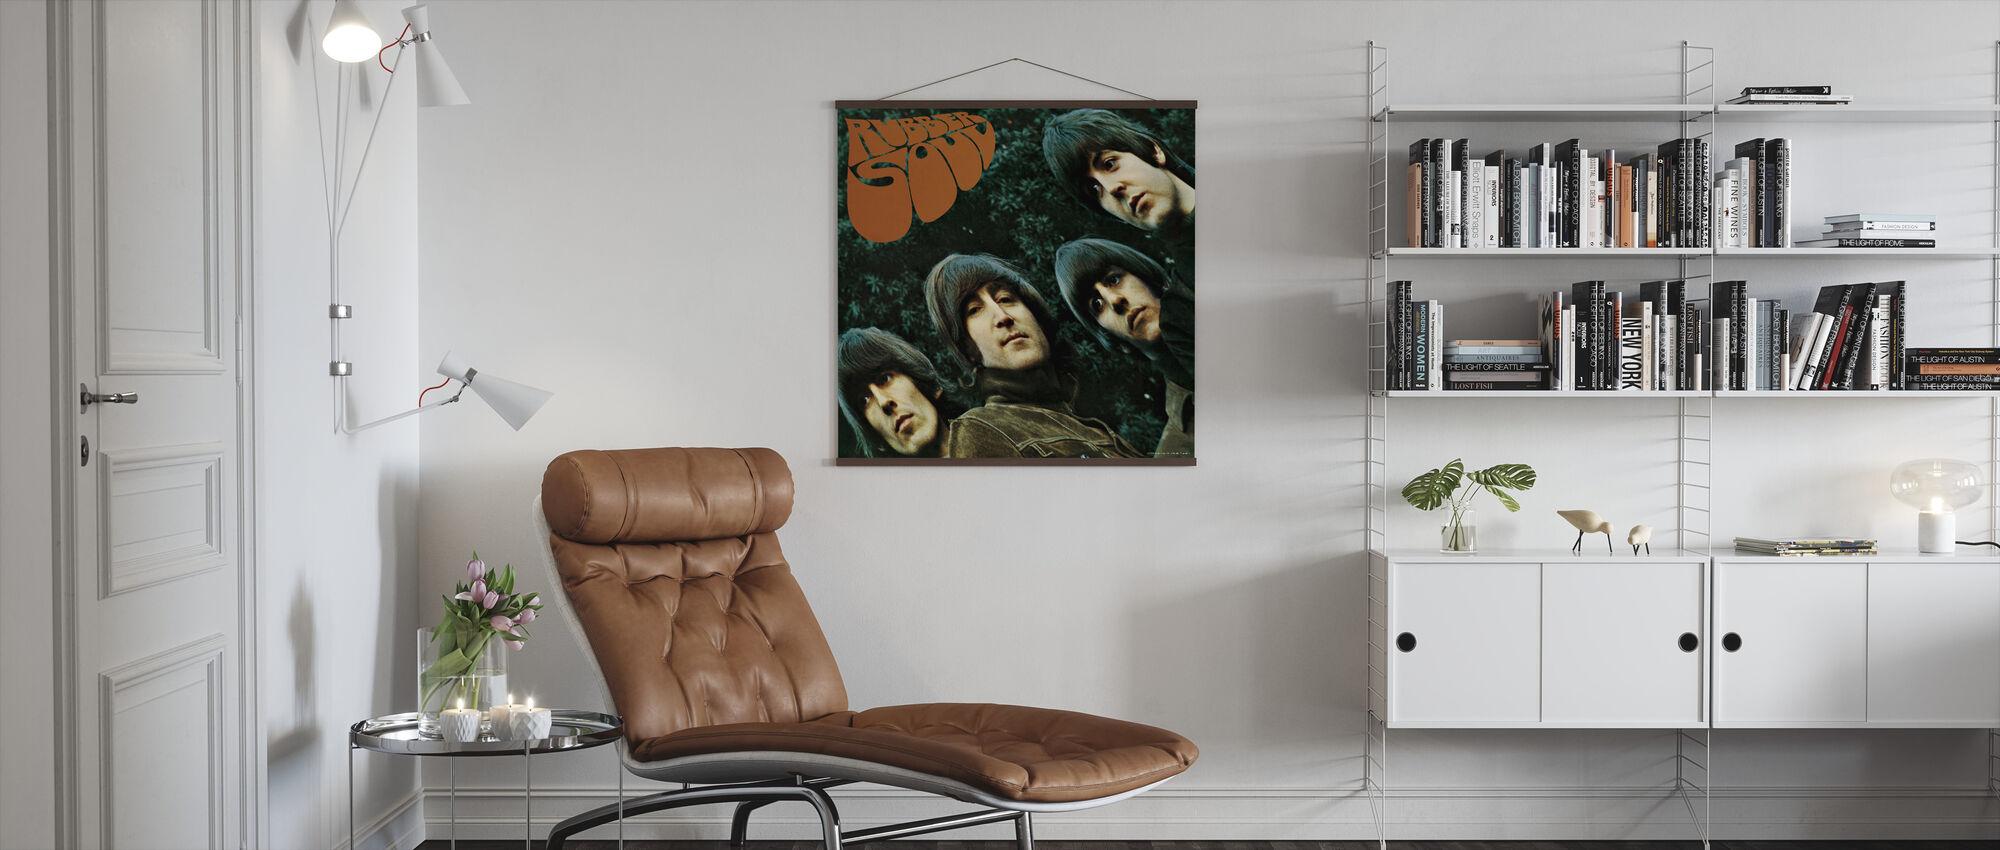 Beatles - Gummi sjæl - Plakat - Stue